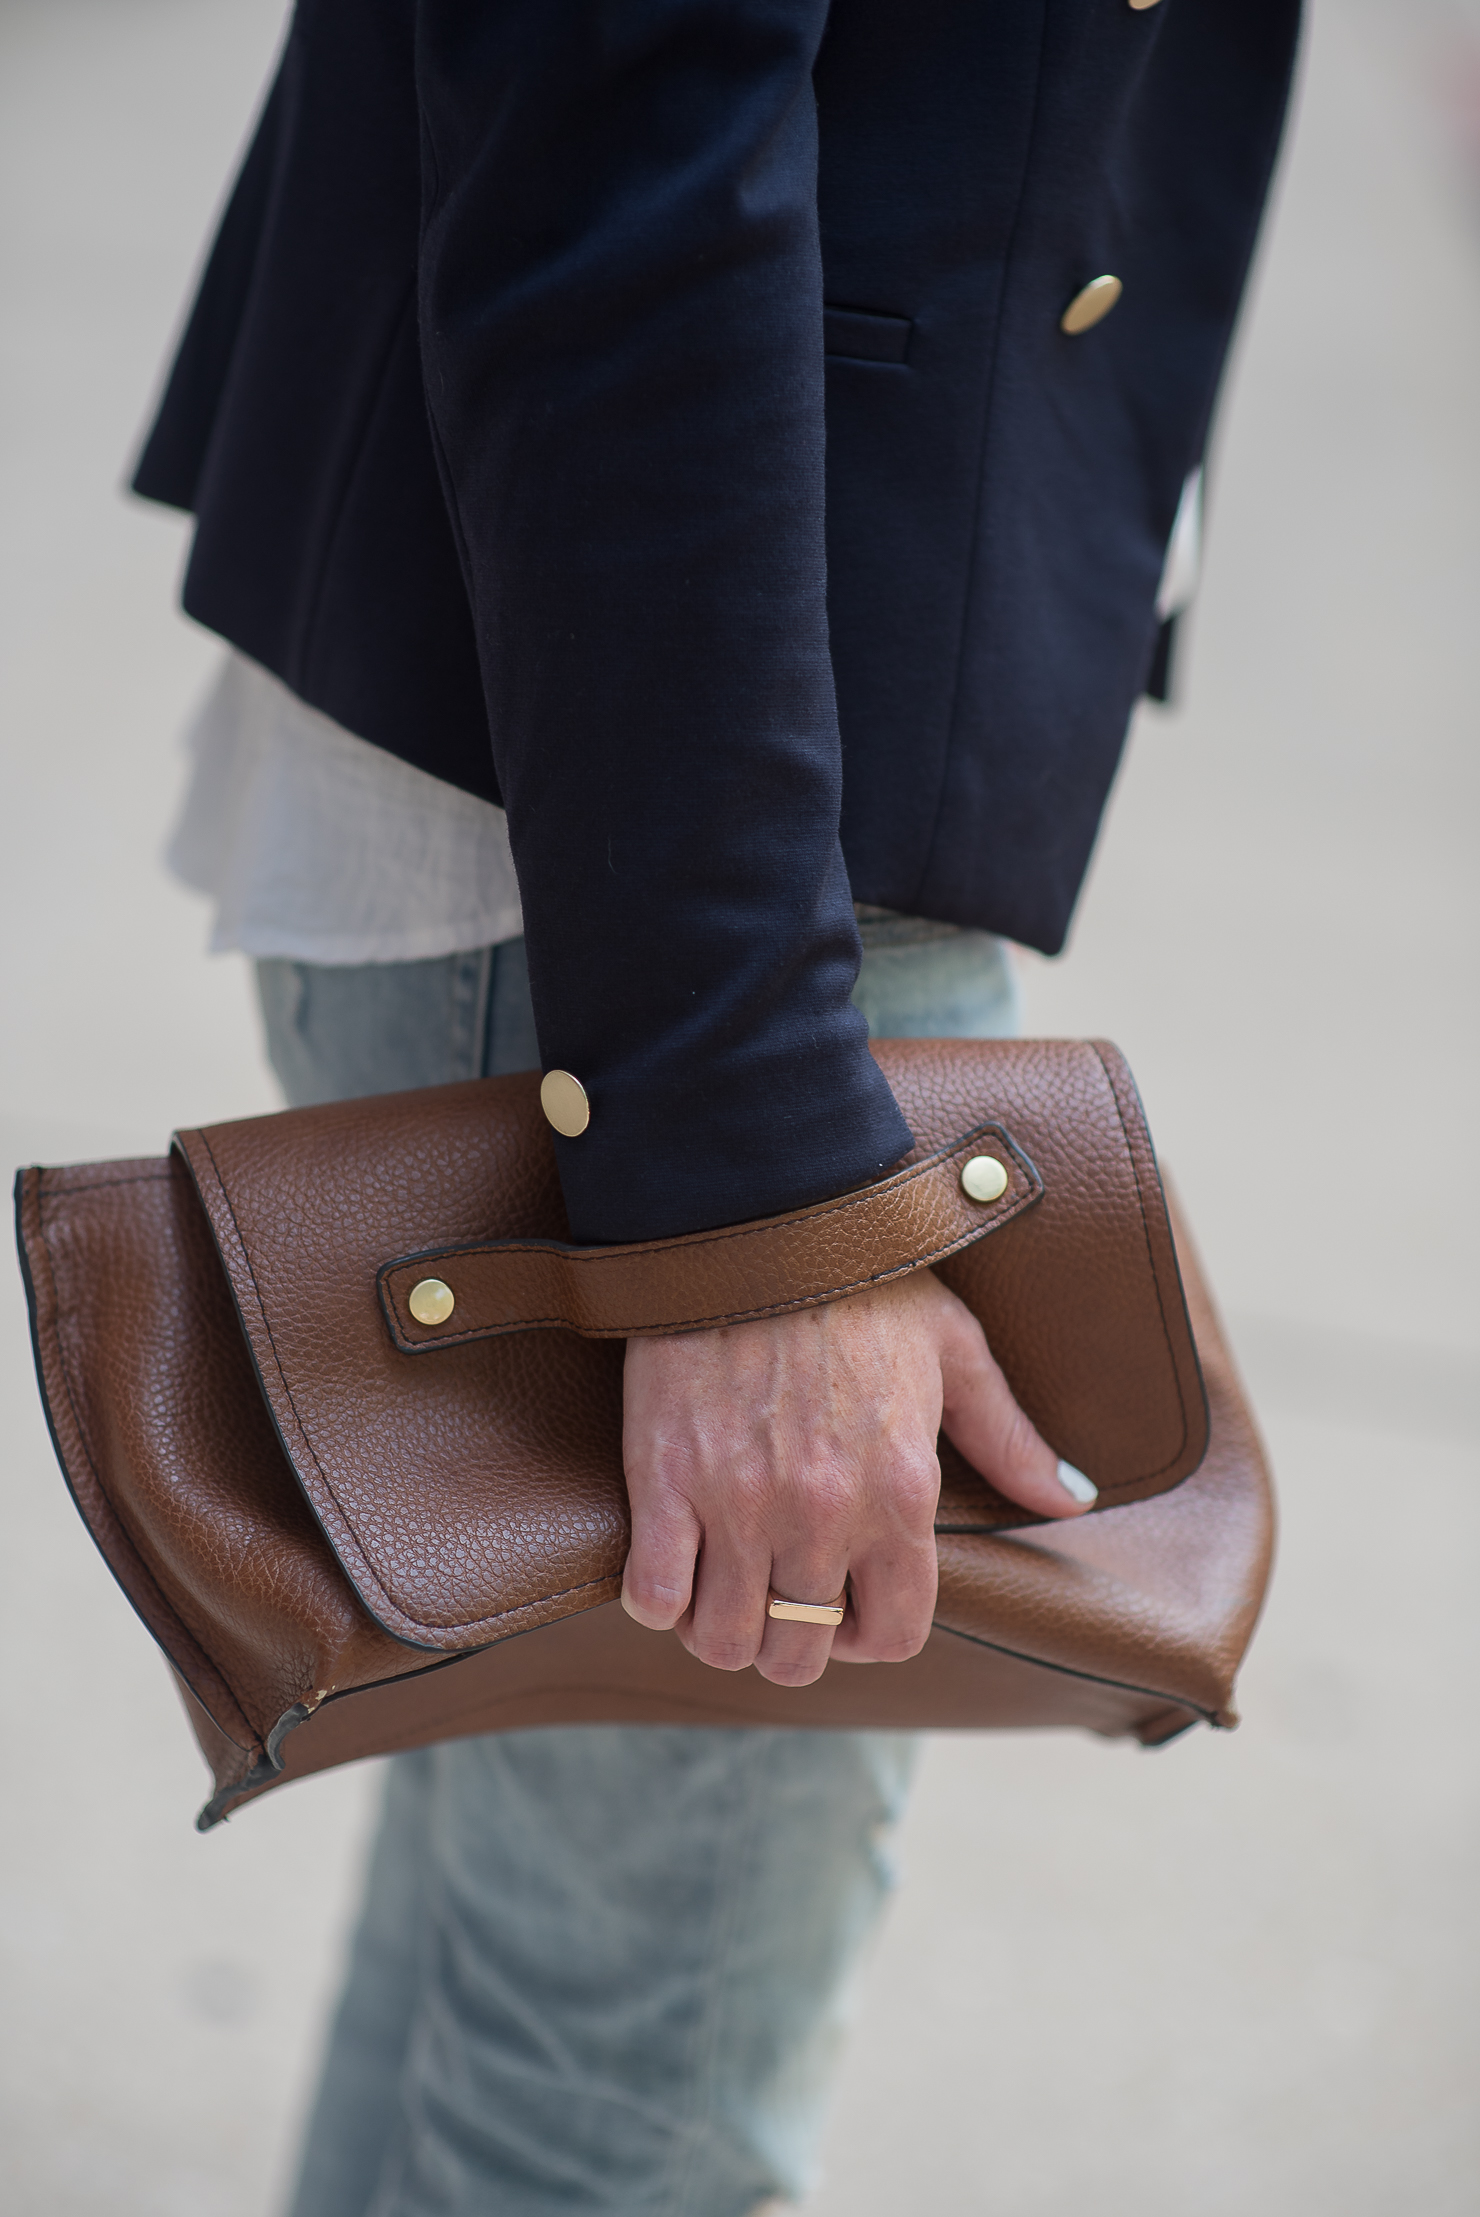 treasure-and-bond-skinny-boyfriend-jeans-hm-gold-button-blazer-zara-clutch-transitioning-to-fall-fashion-city-chic